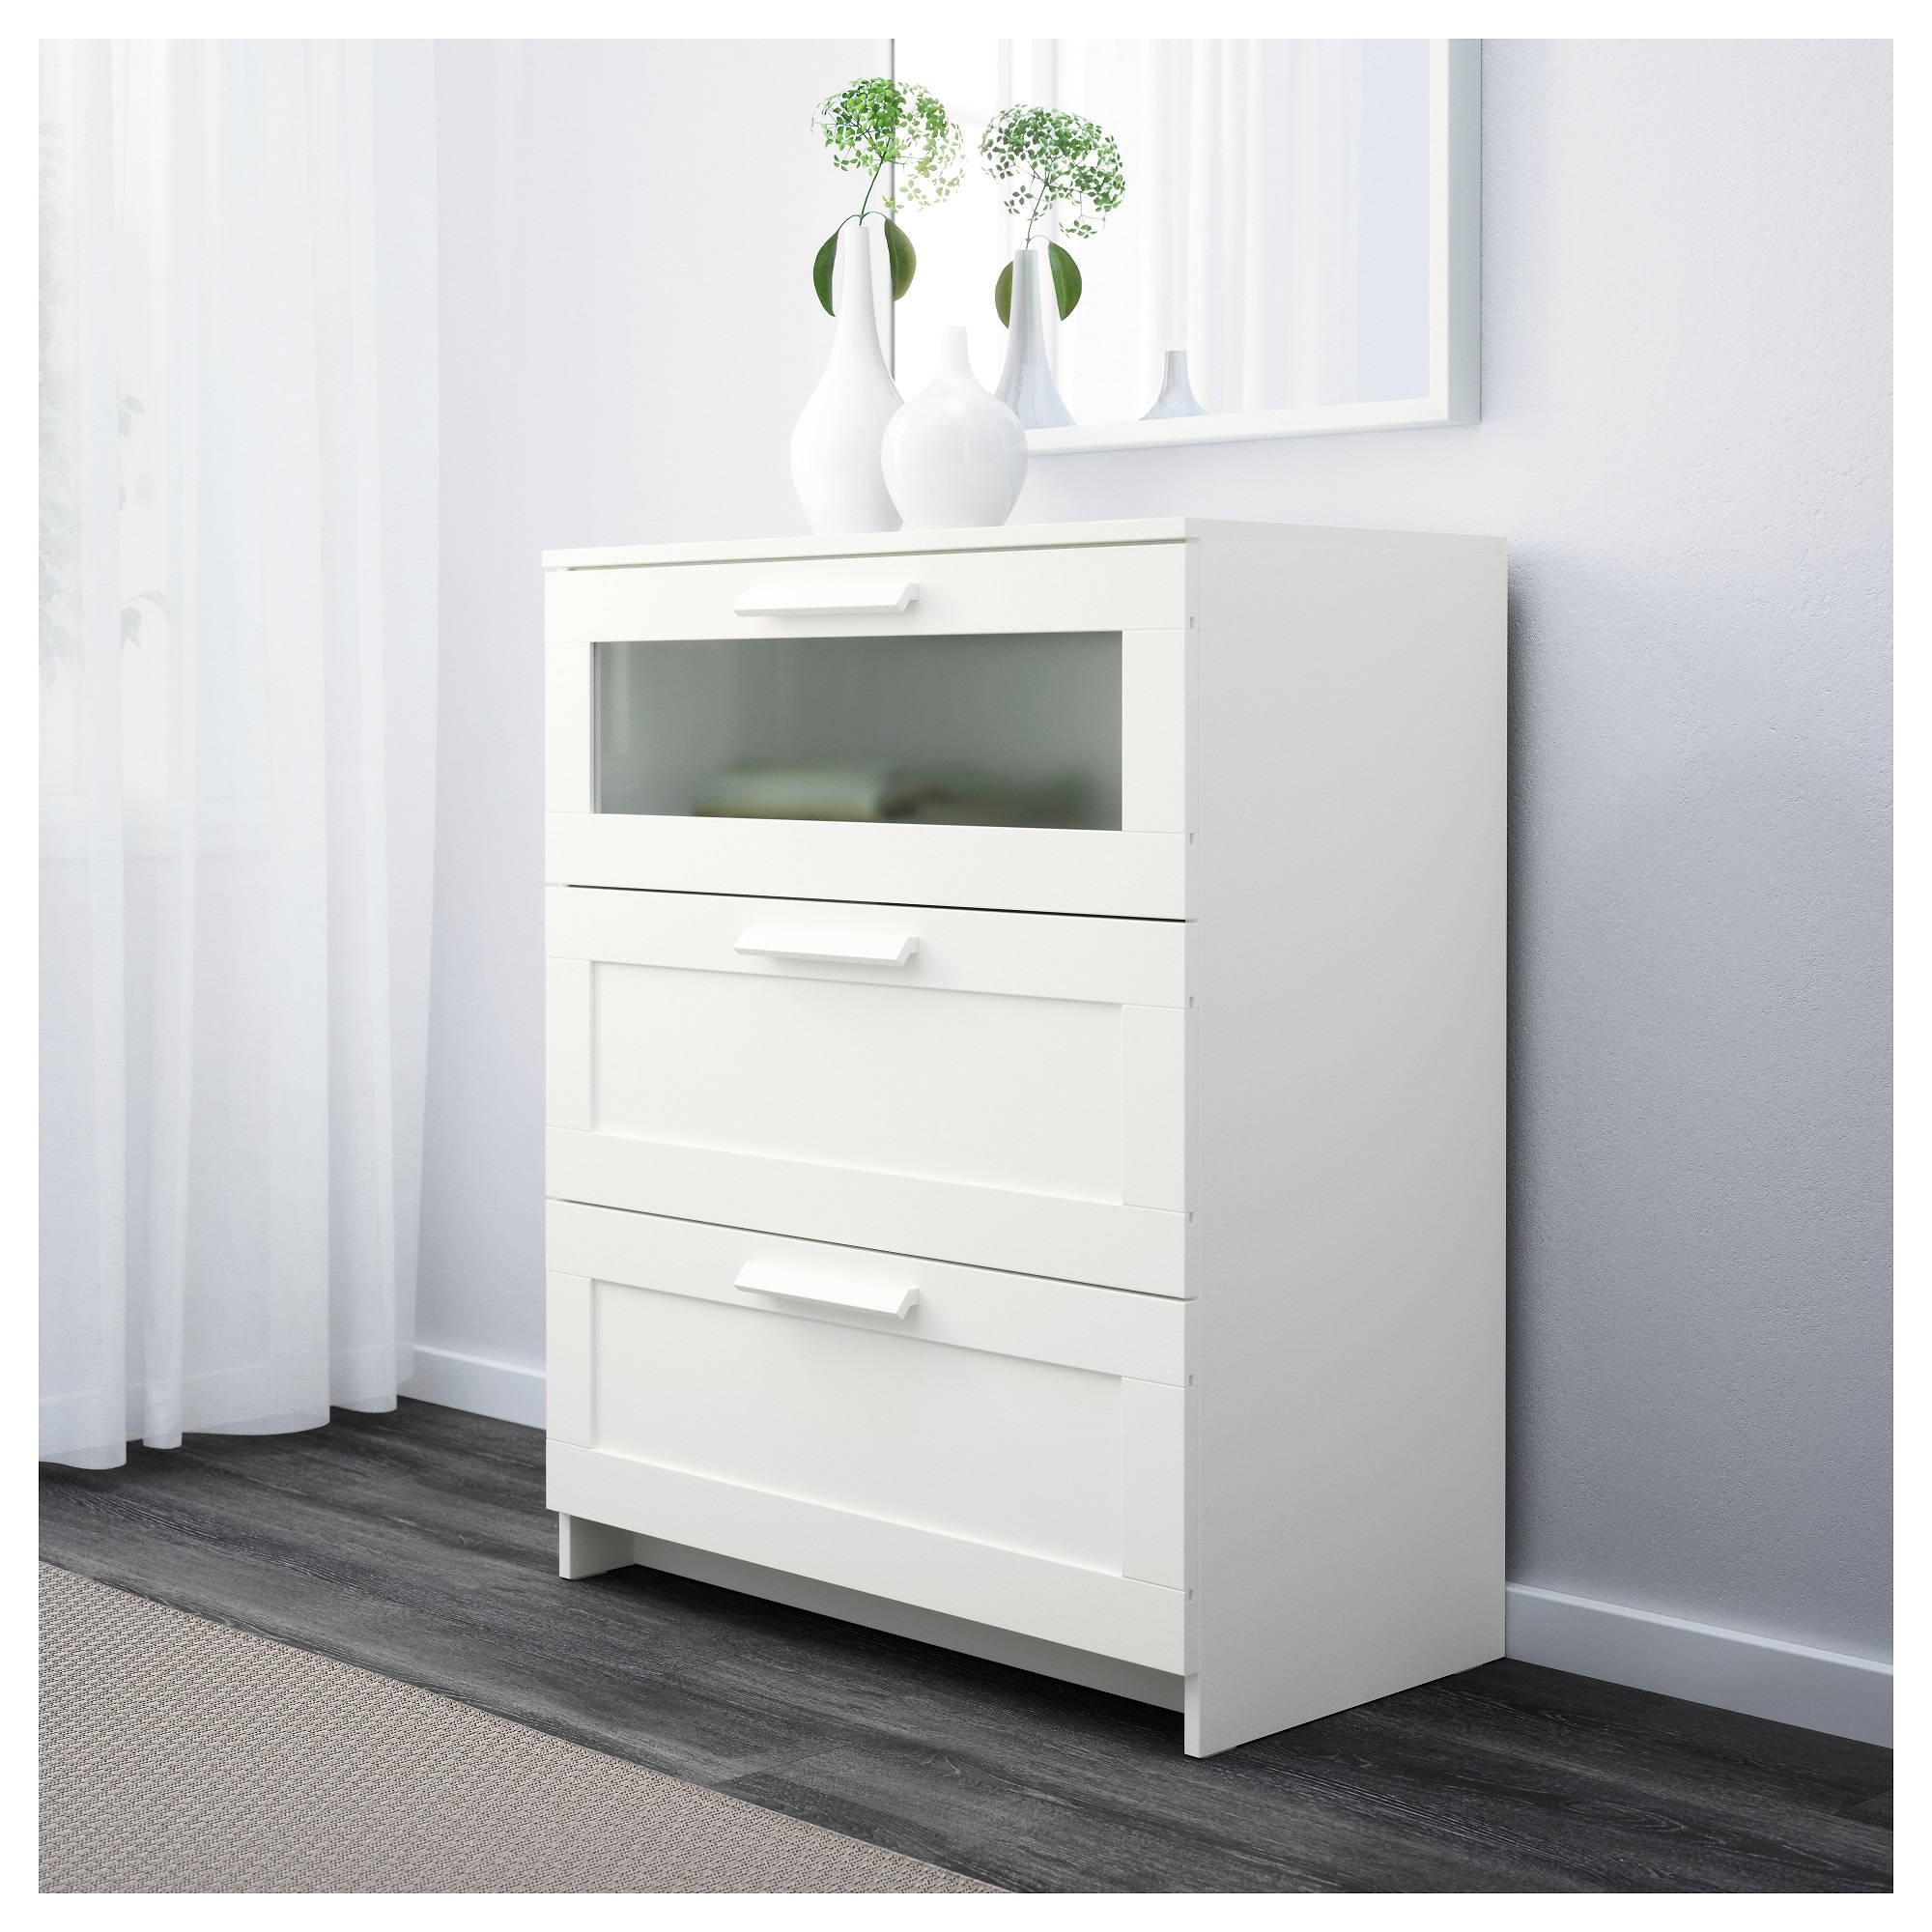 Brimnes Ikea Kommode 2021